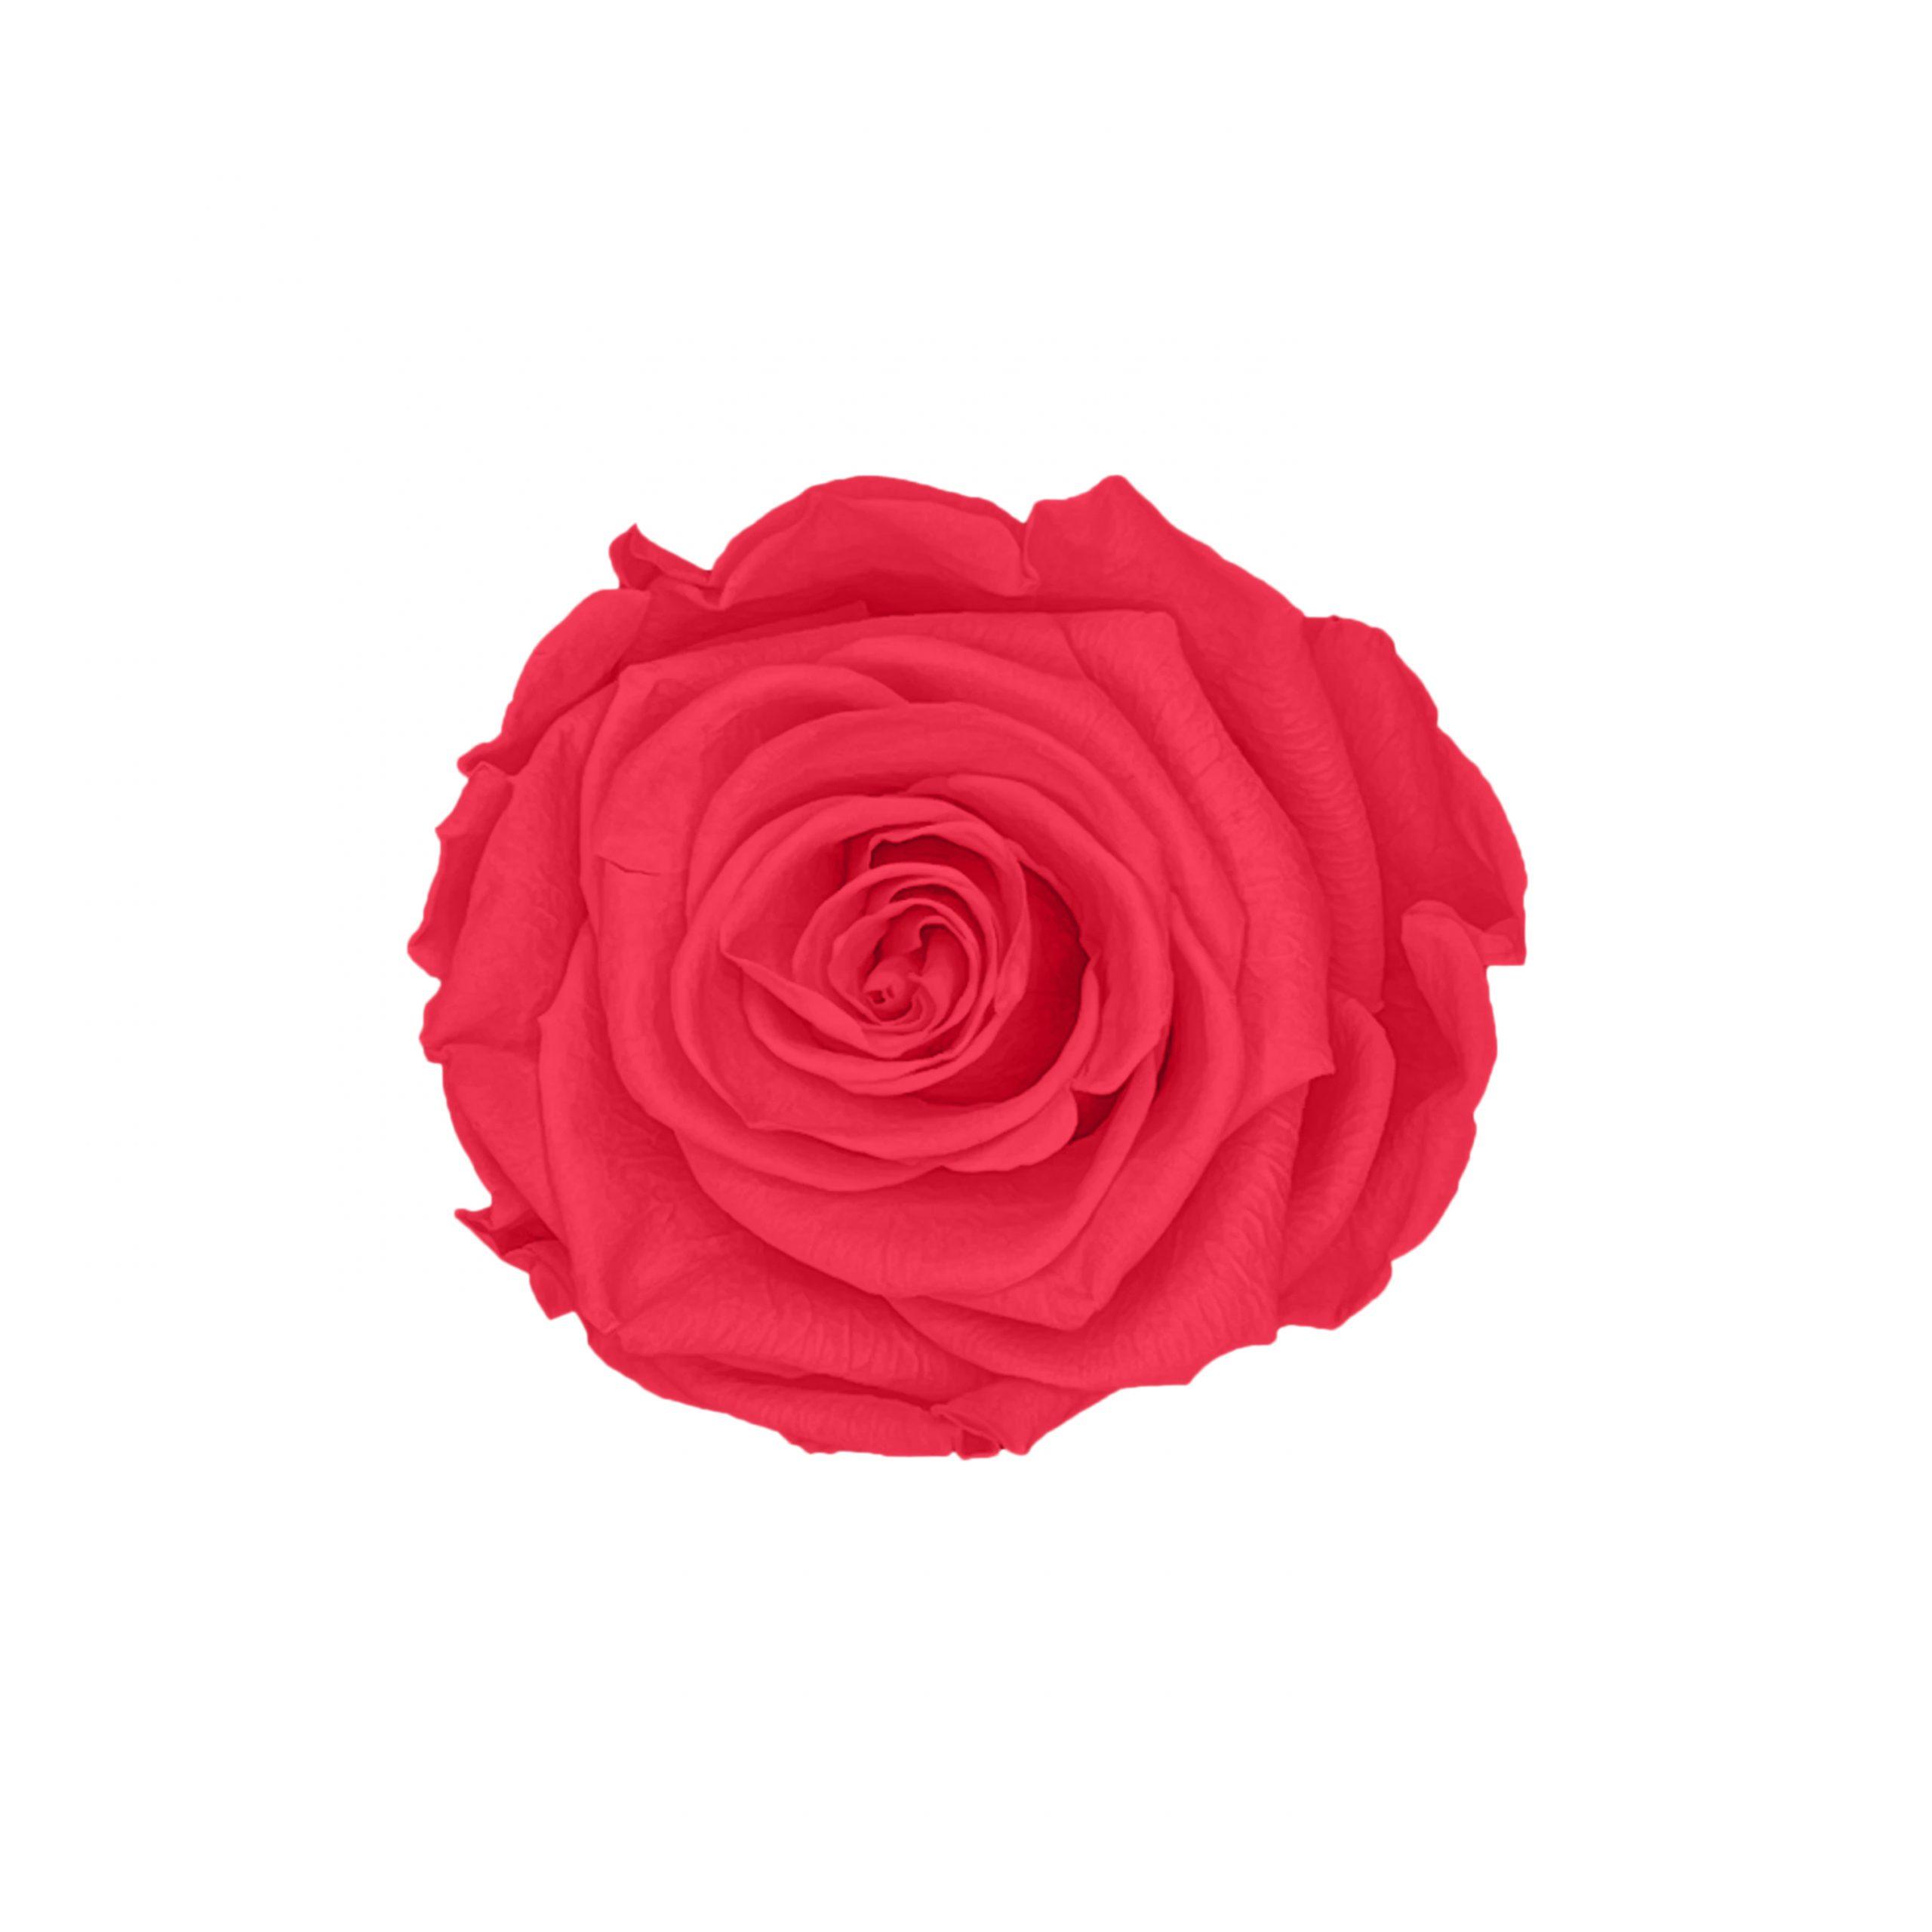 Infinity rose peach pink